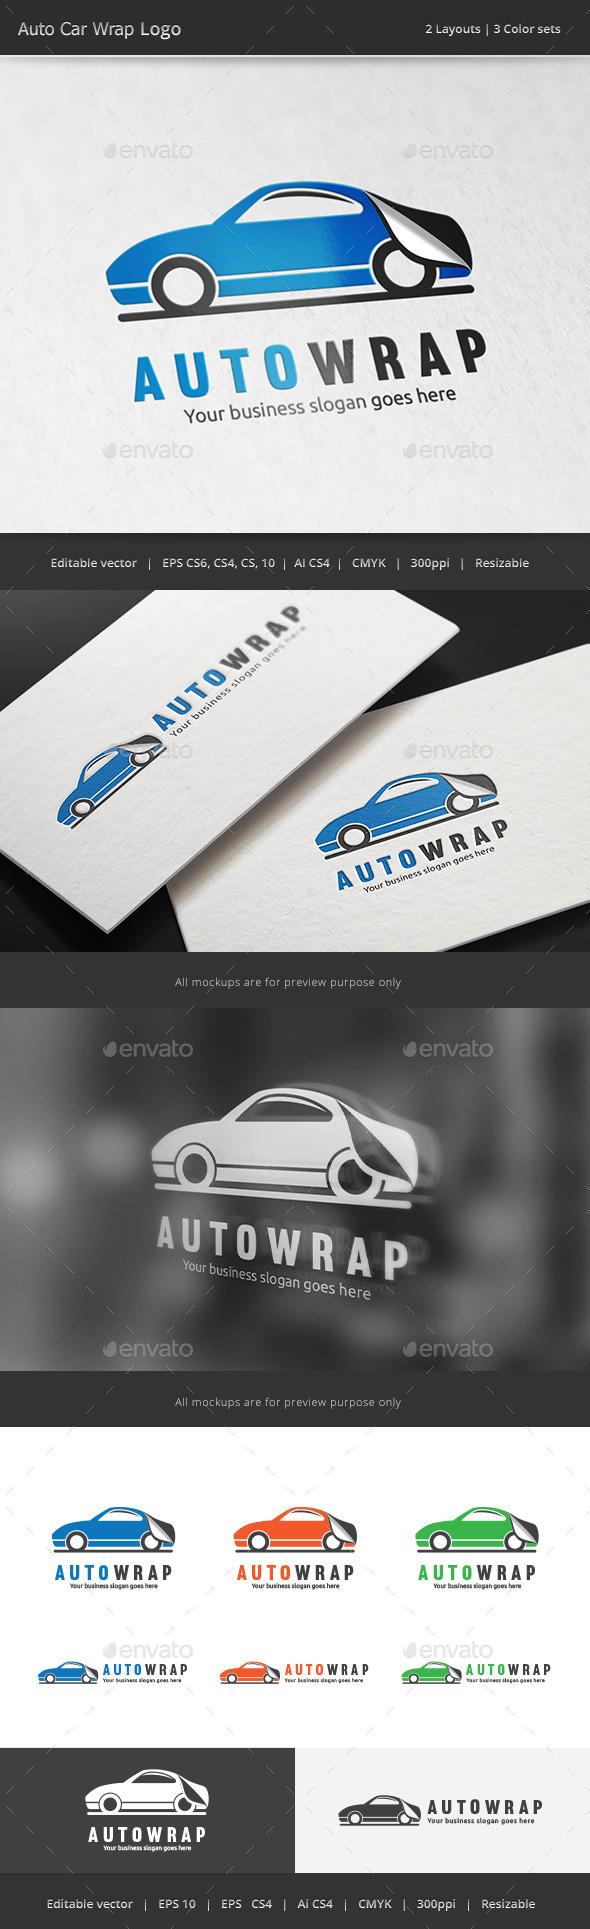 elit templates sticker - car sticker wrap logo by wheeliemonkey graphicriver